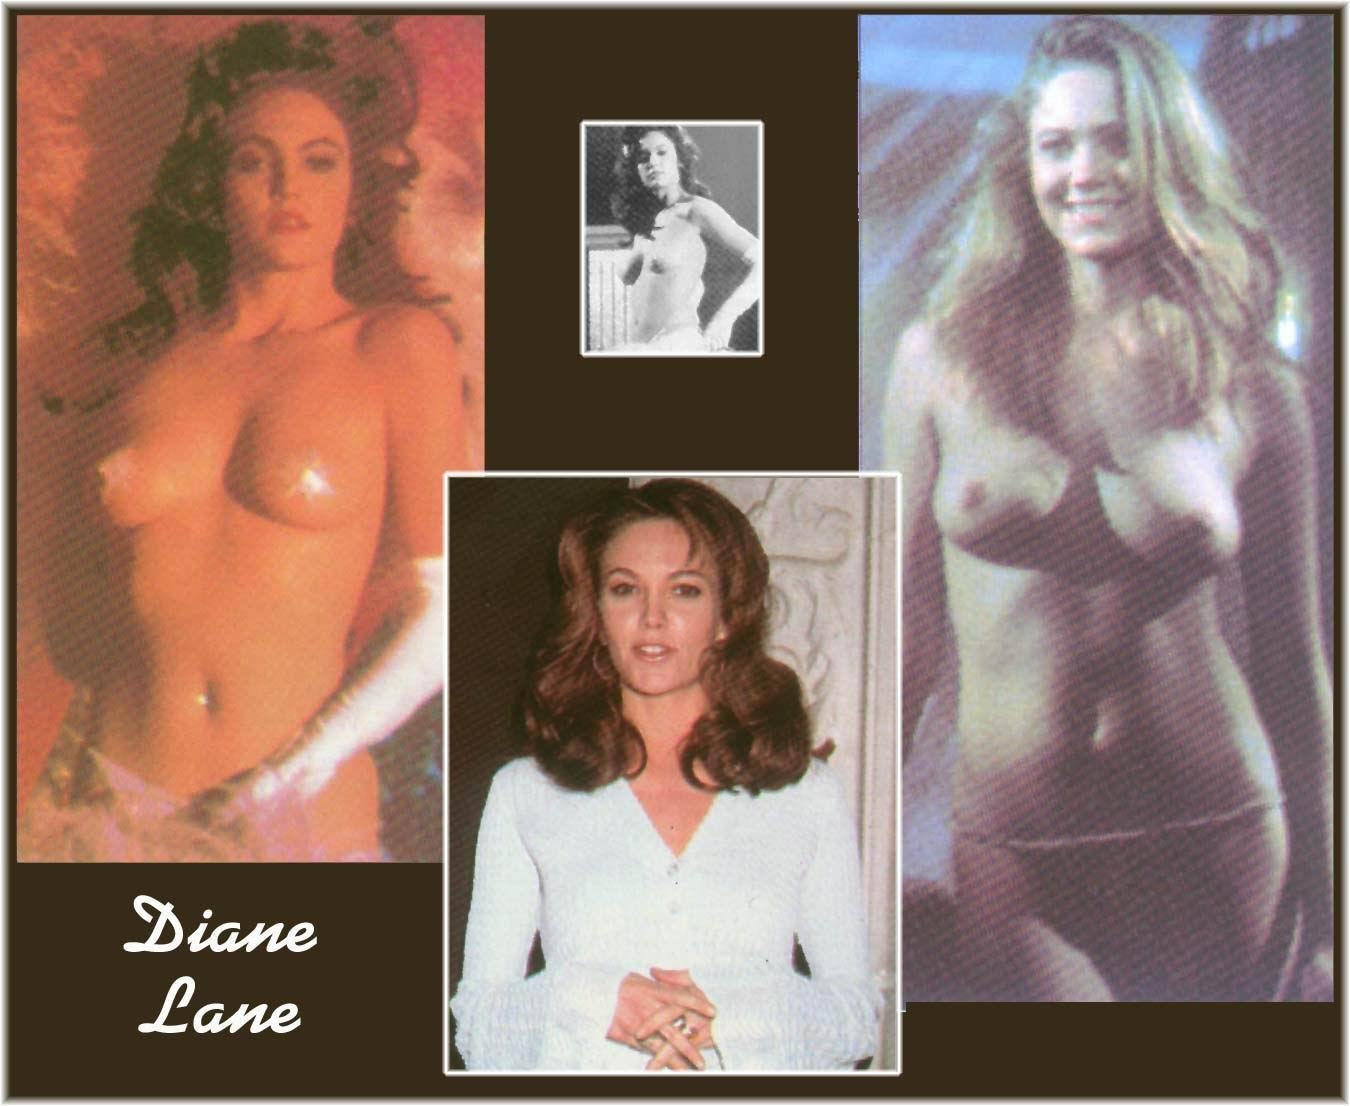 Fotos De Diane Lane Desnuda Página 1 Fotos De Famosastk